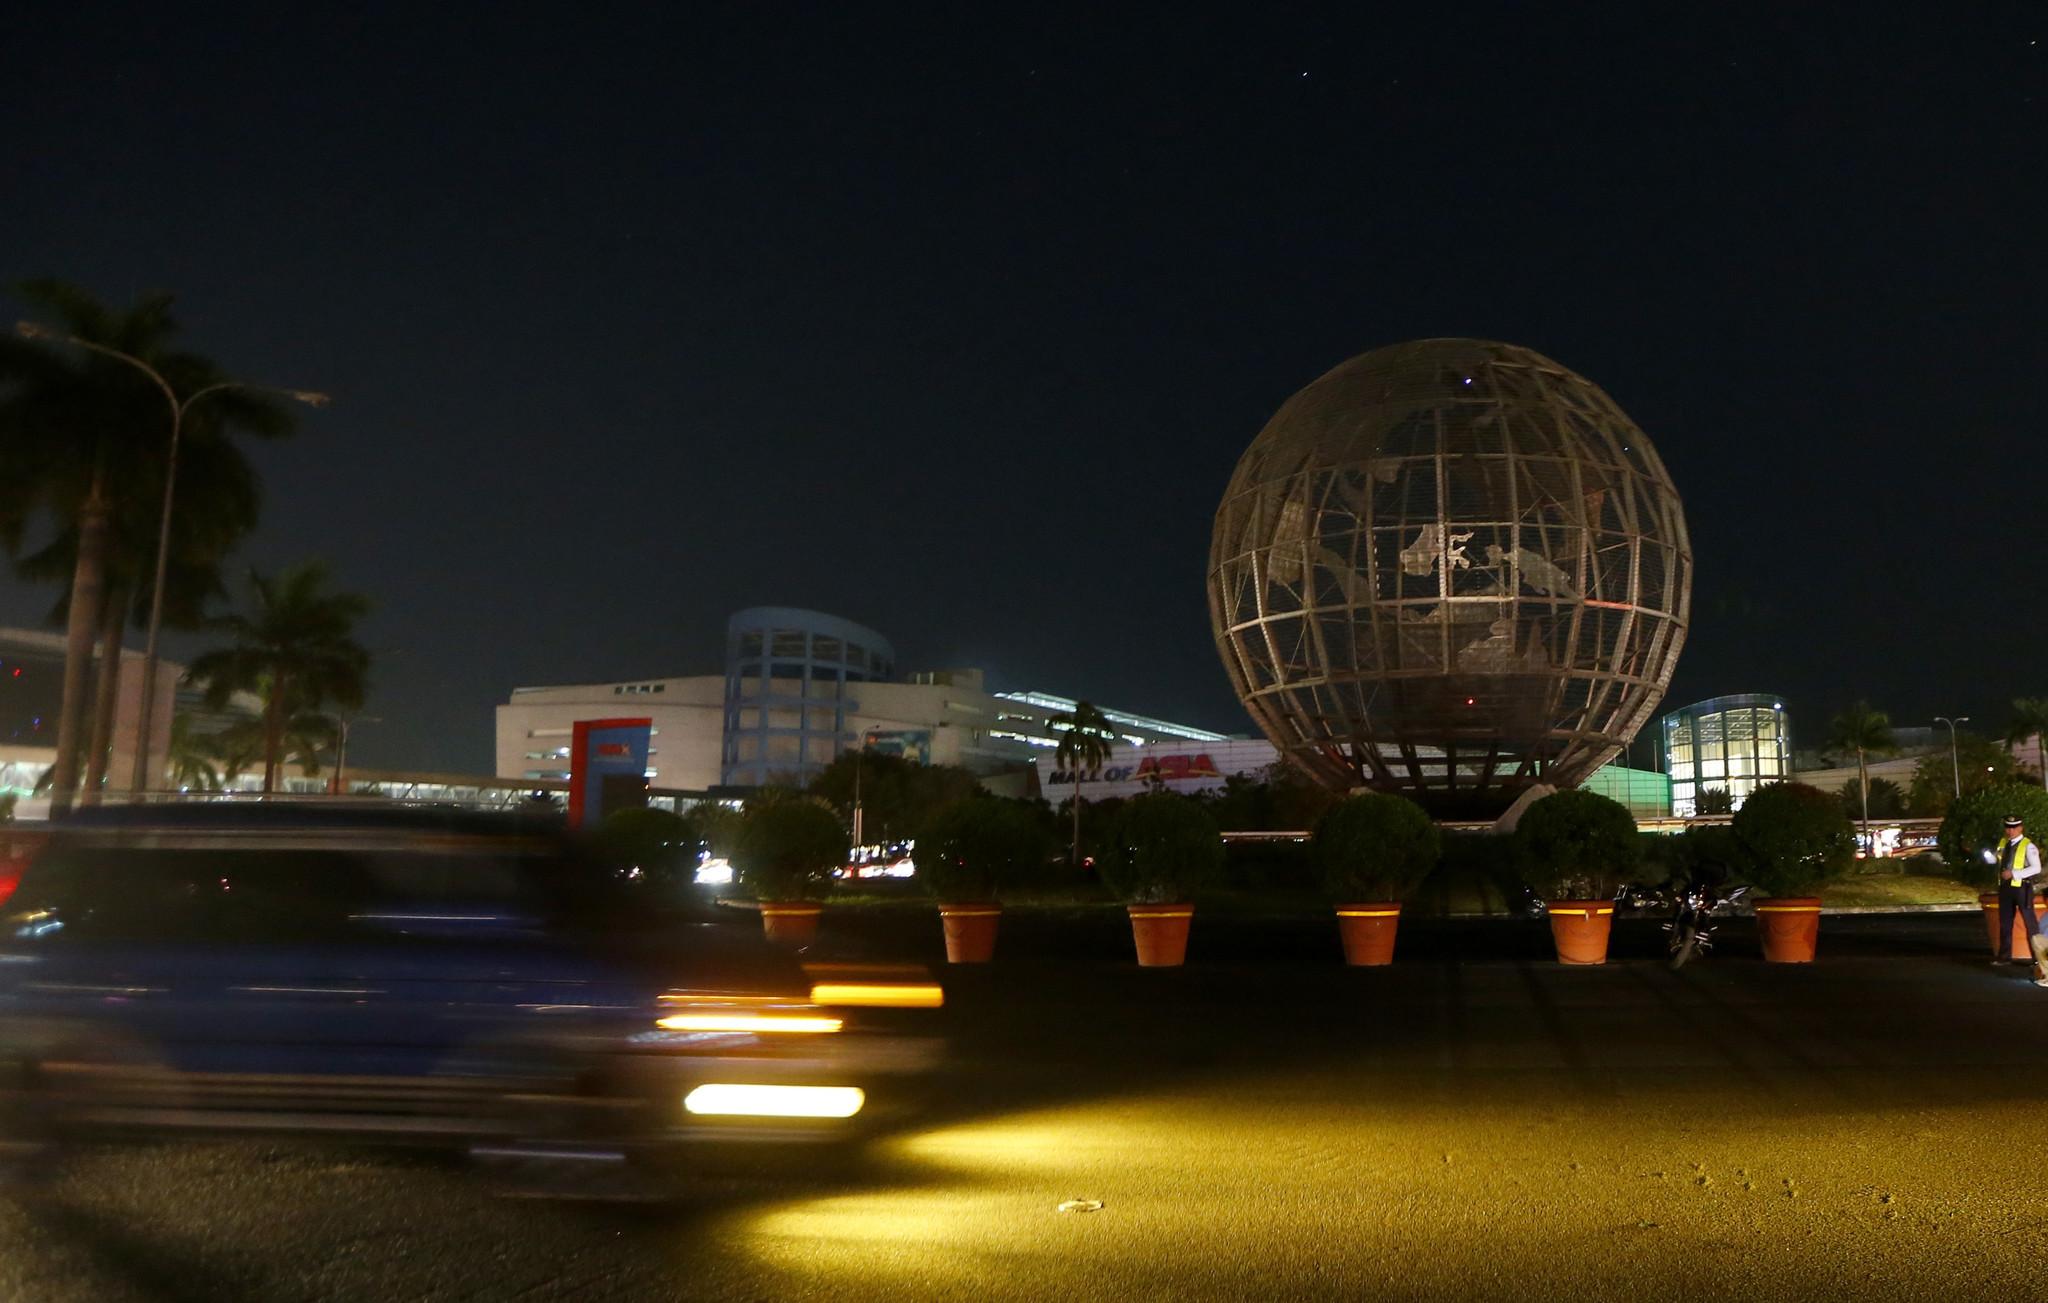 Across the globe, lights go dark for Earth Hour to ...